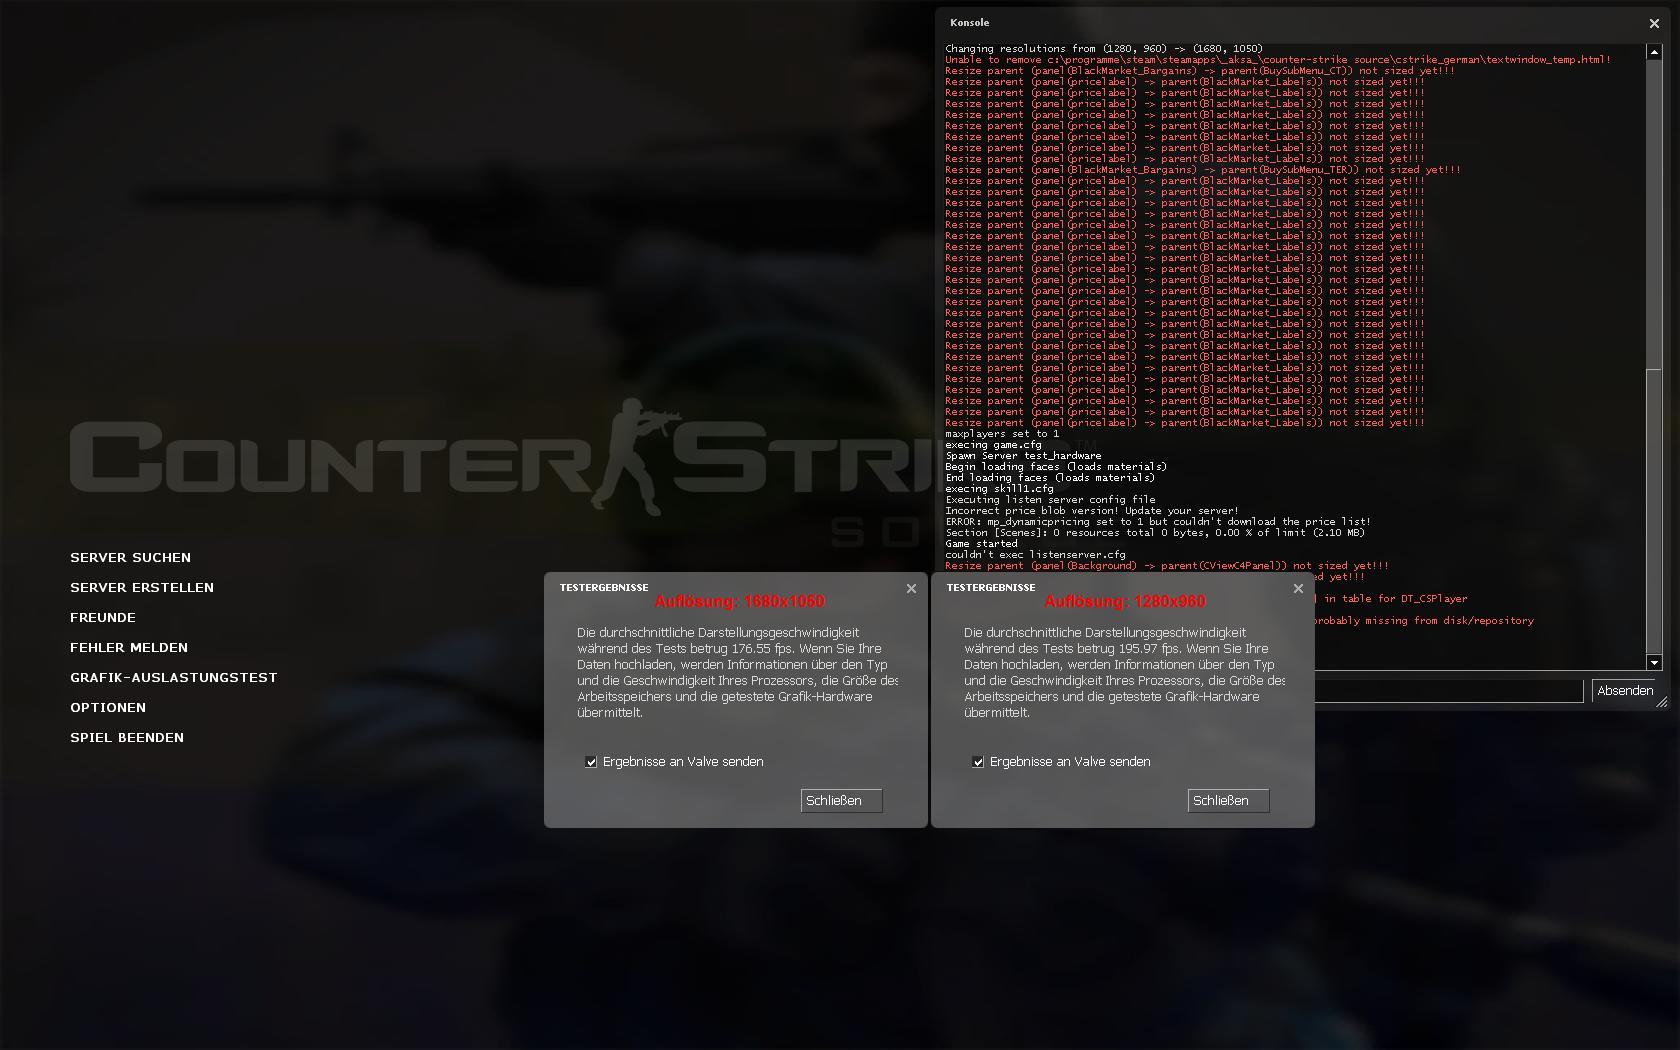 FPS immer konstant - egal welche Auflösung oder Detailstufe ...